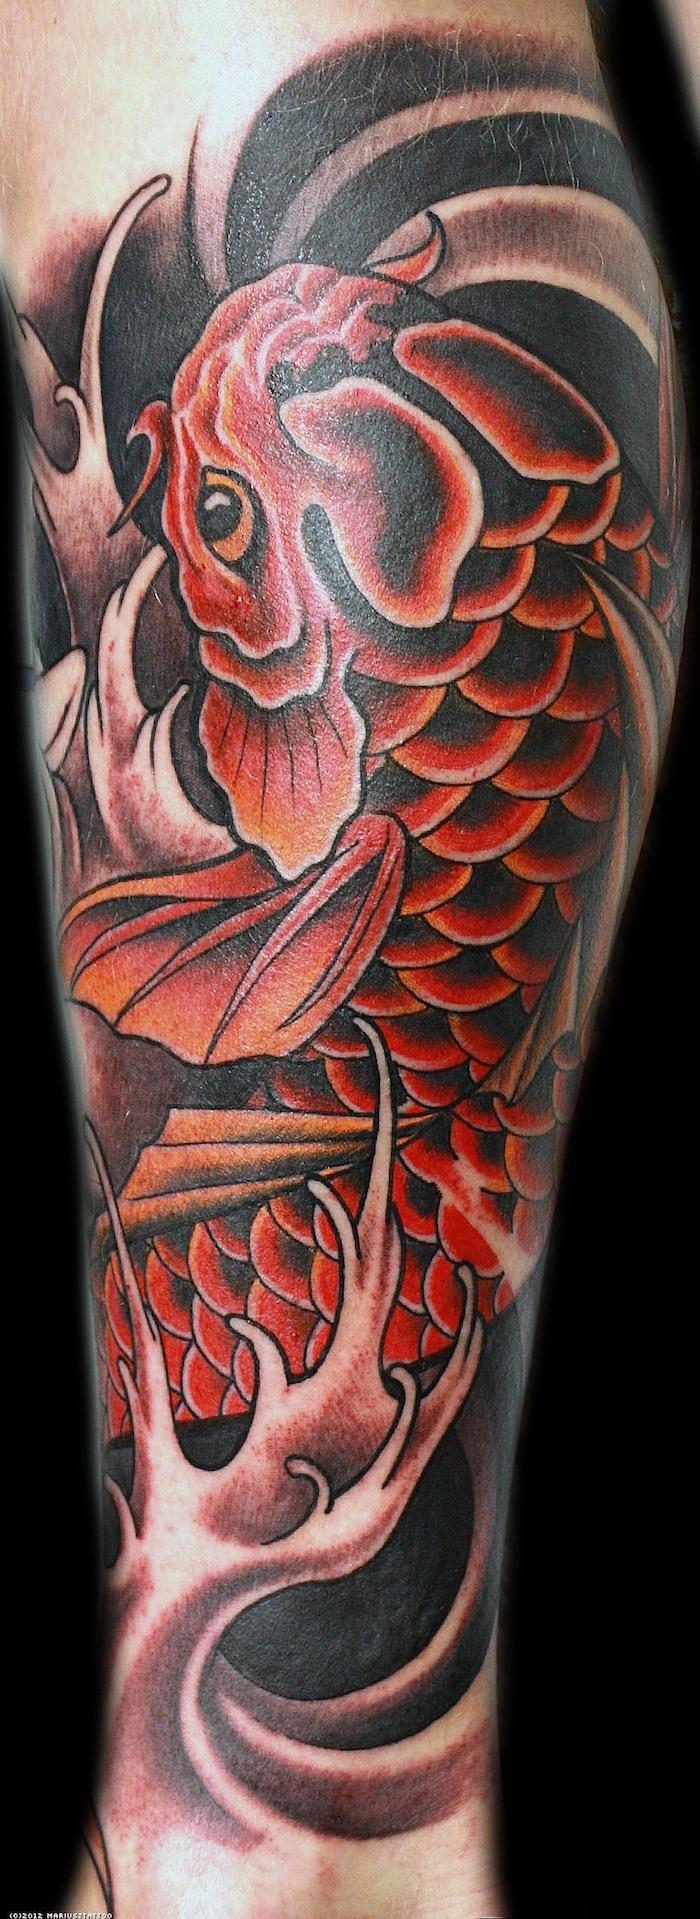 1001 id es tatouage carpe koi la force tranquille en for Carpe koi orange